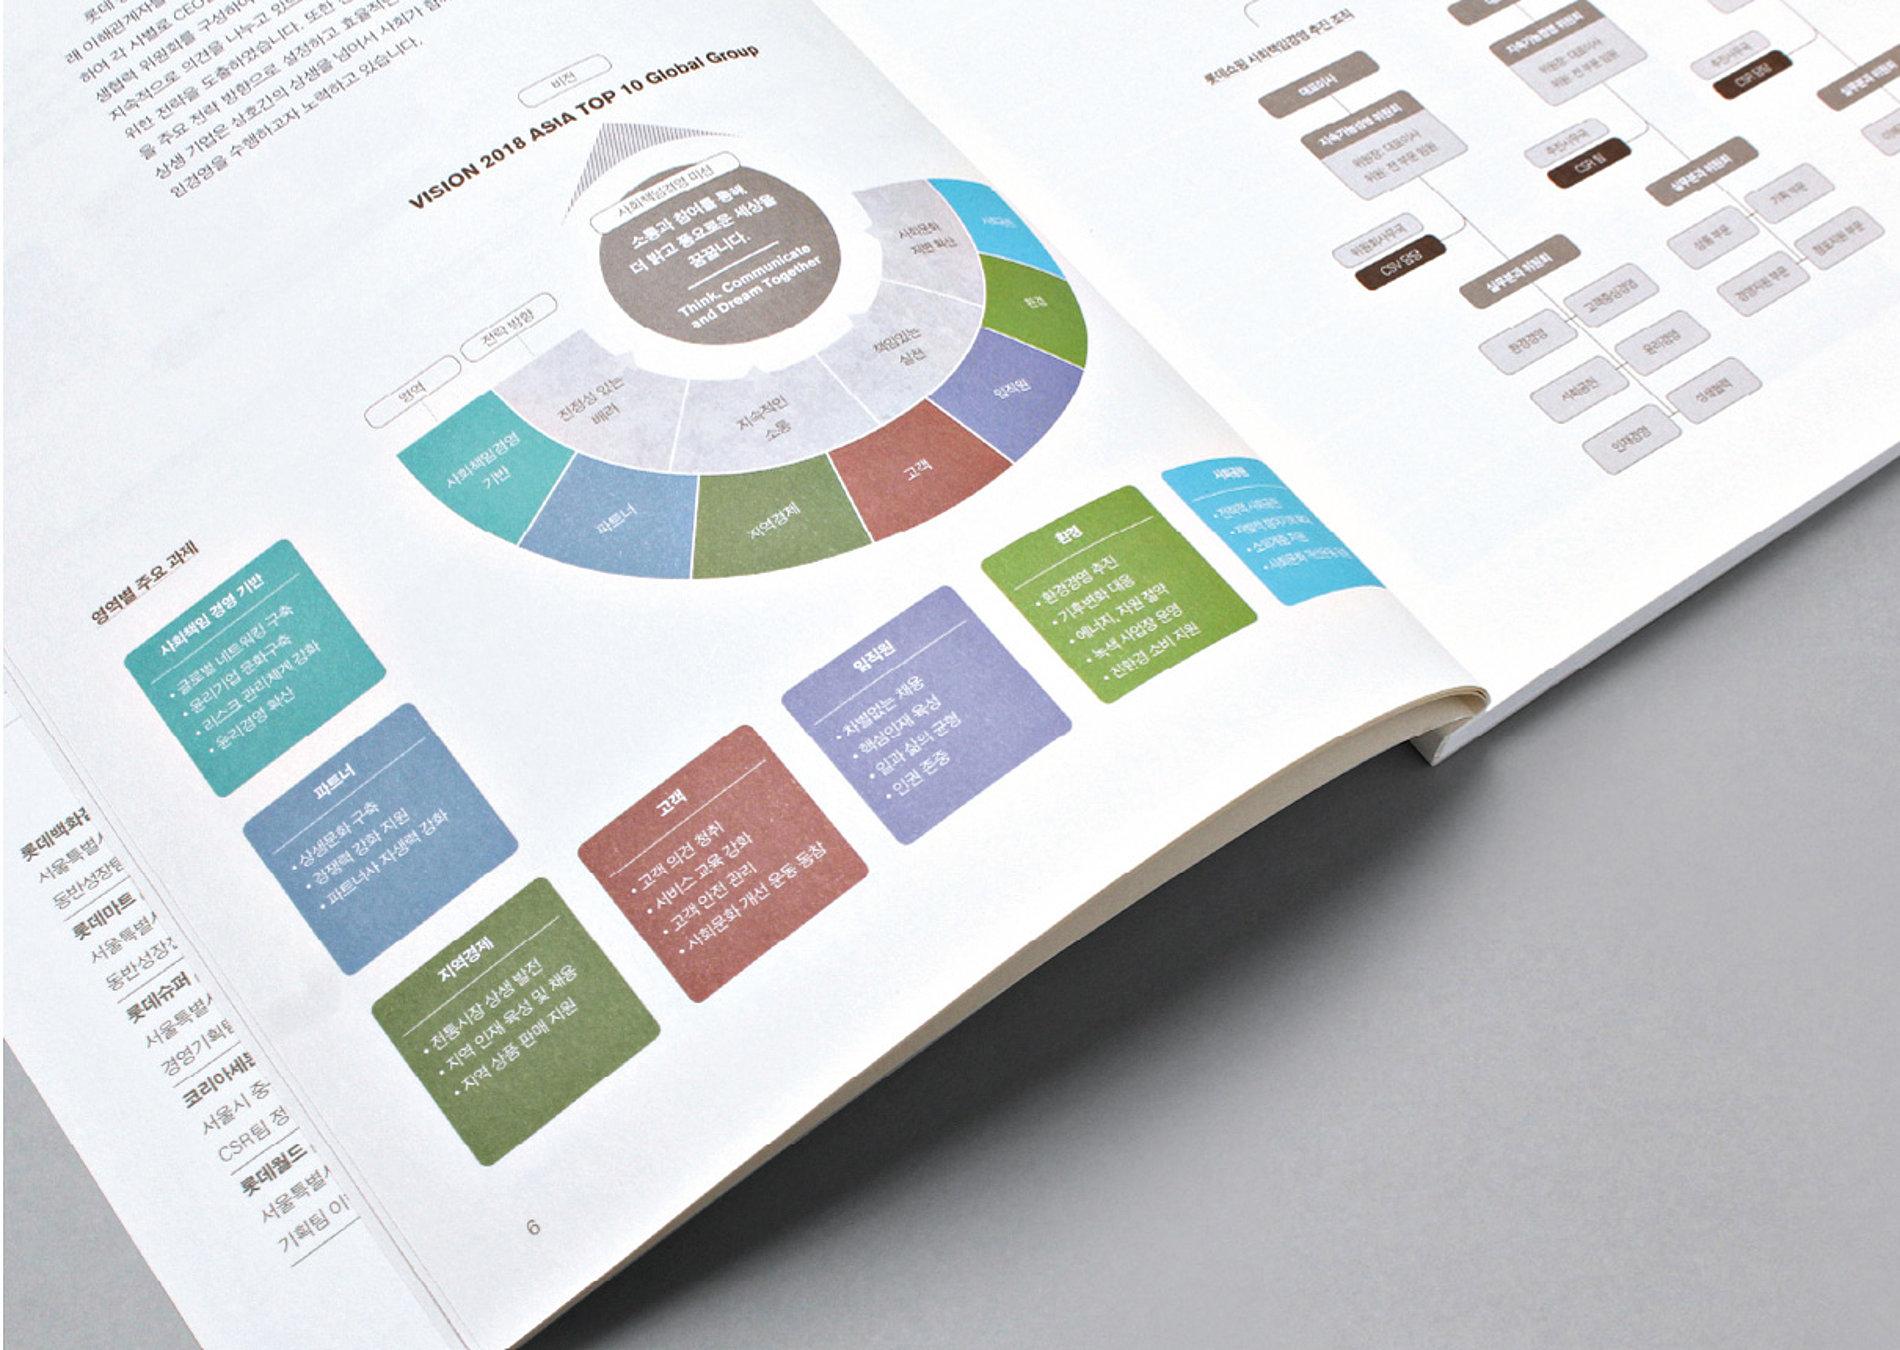 Lotte Corporate Social Responsibility Report 2015   Red Dot Design Award